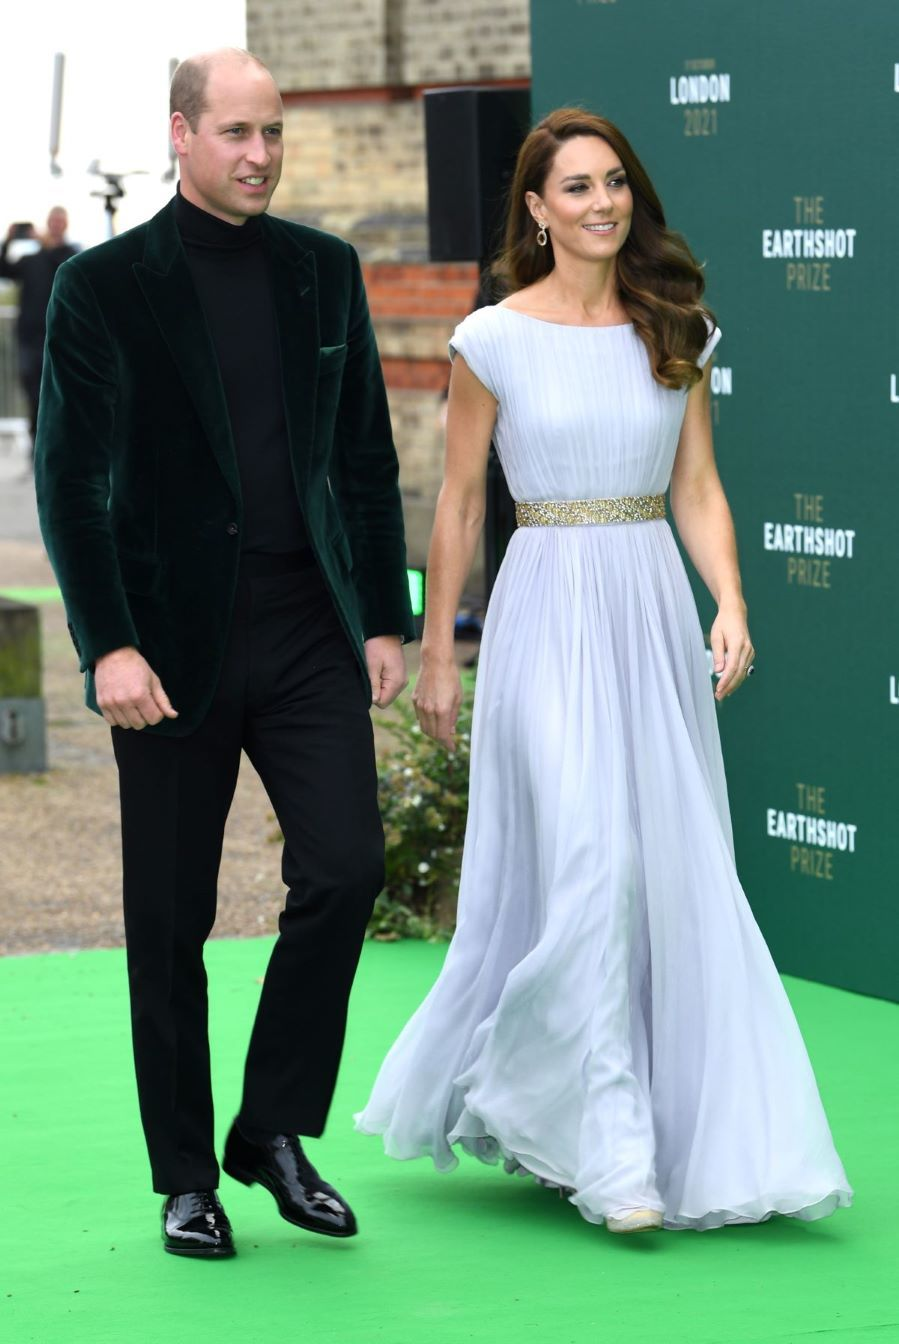 Kate Middleton de Alexander McQueen - Premios Earthshot 2021 en el Alexandra Palace de Londres